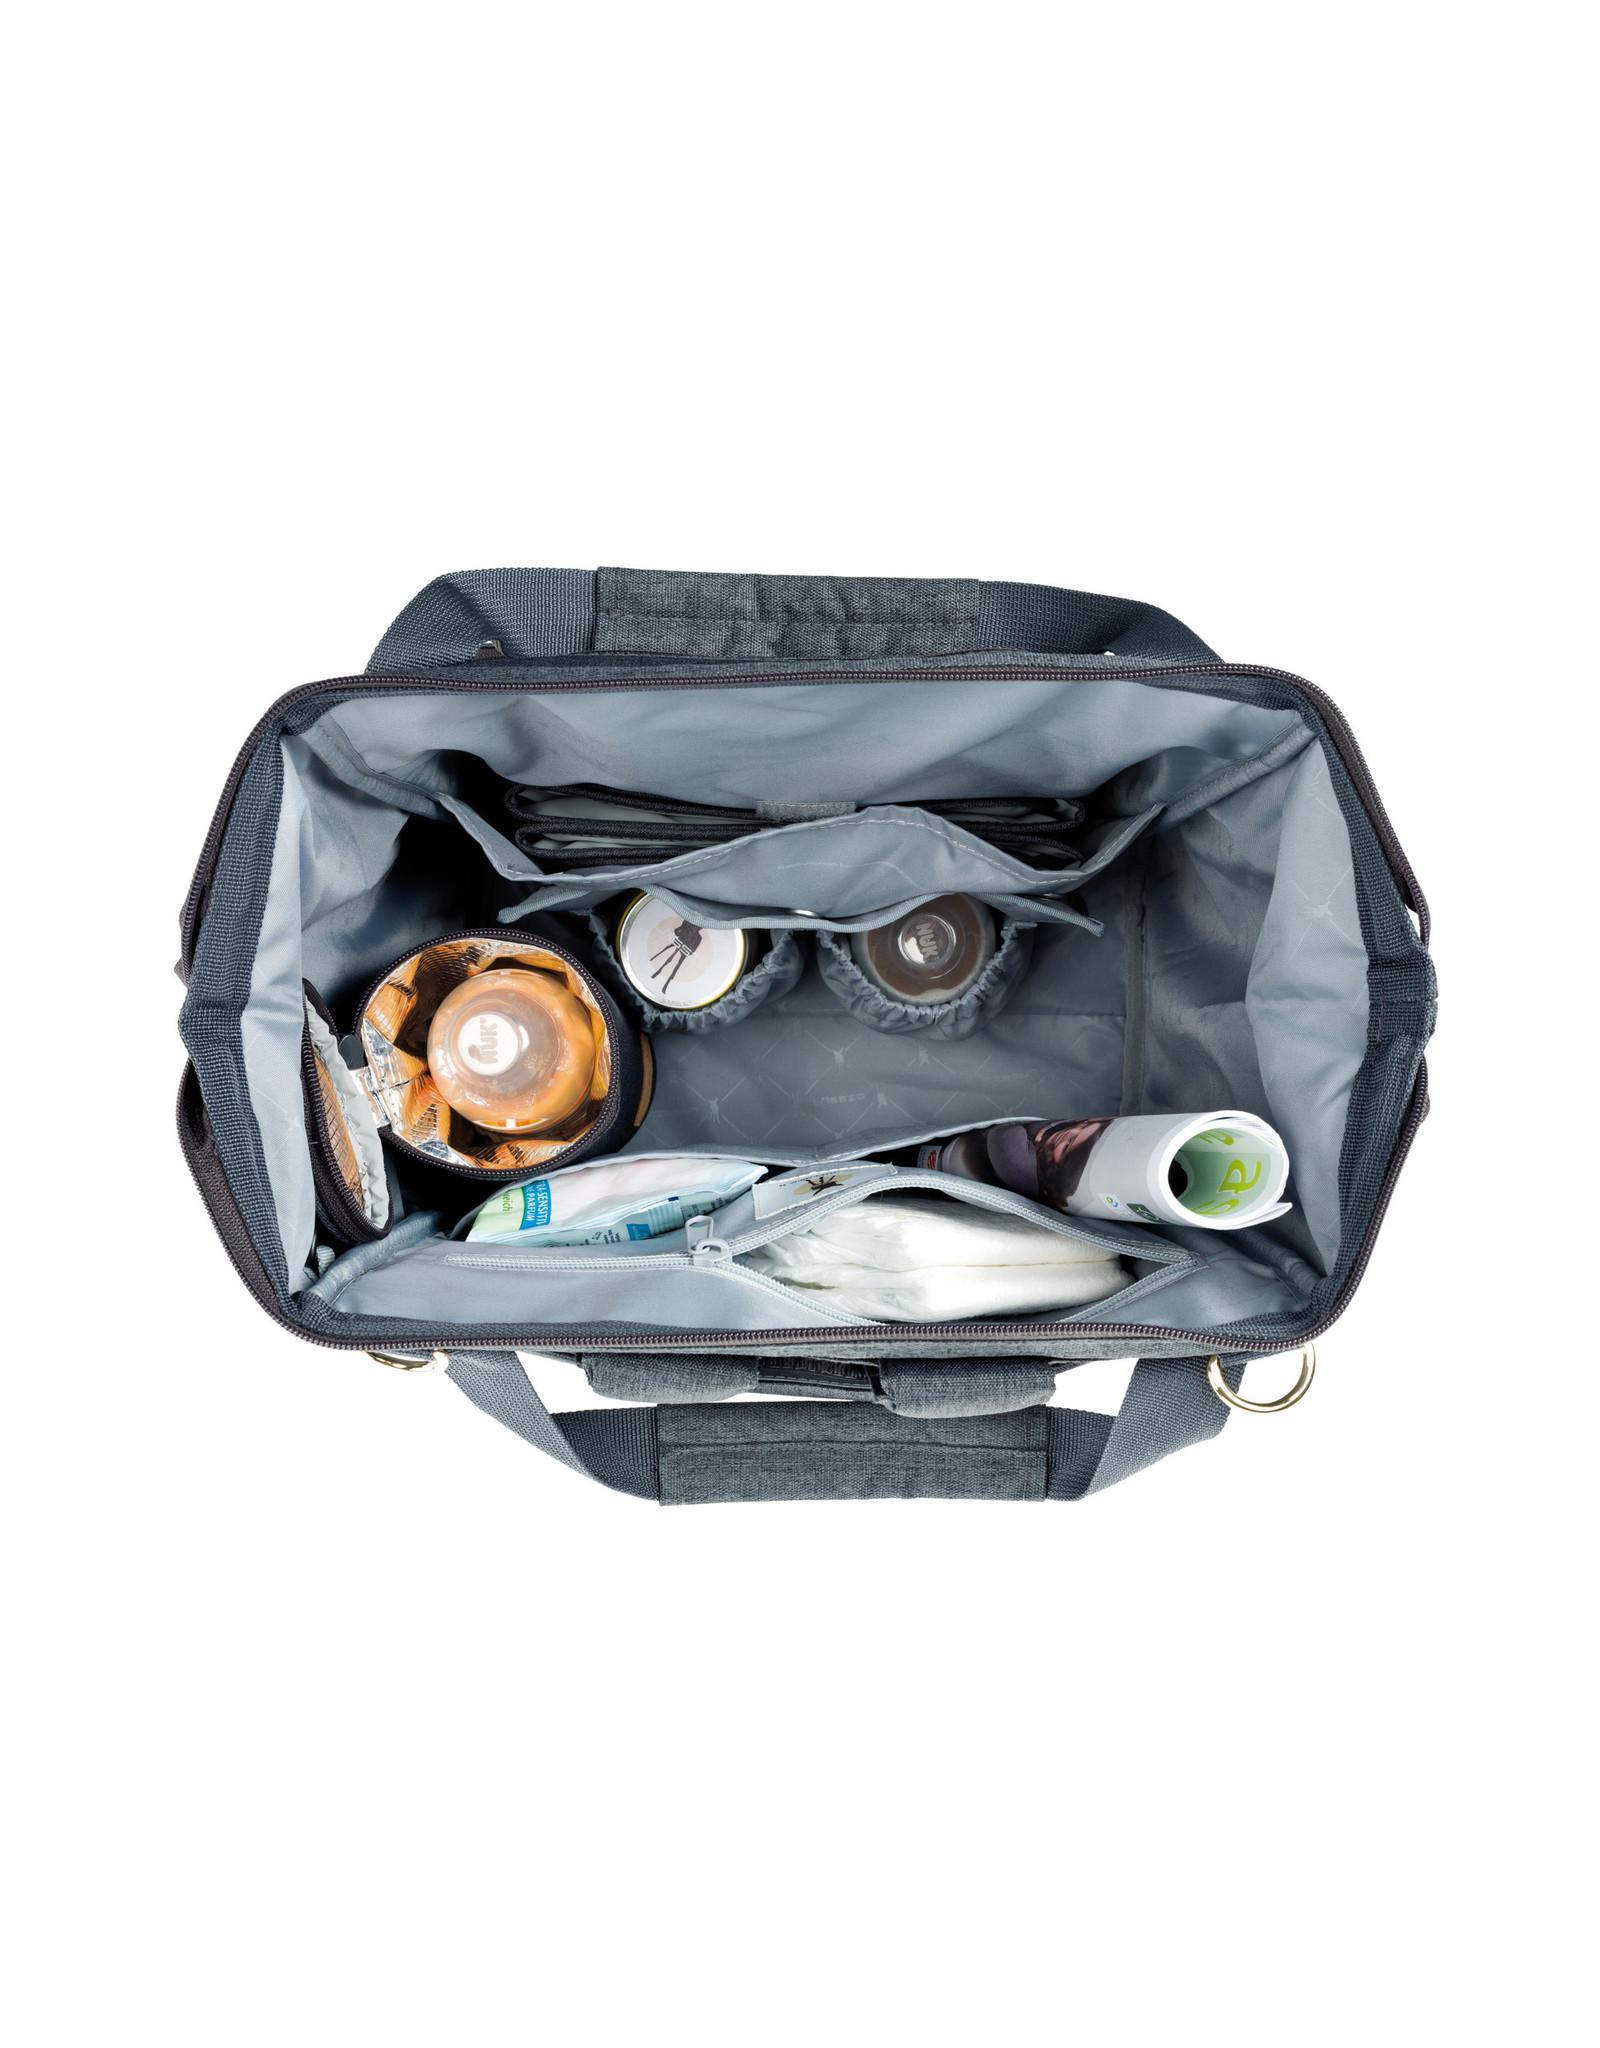 Lassig Lassig Glam Goldie Backpack Anthracite